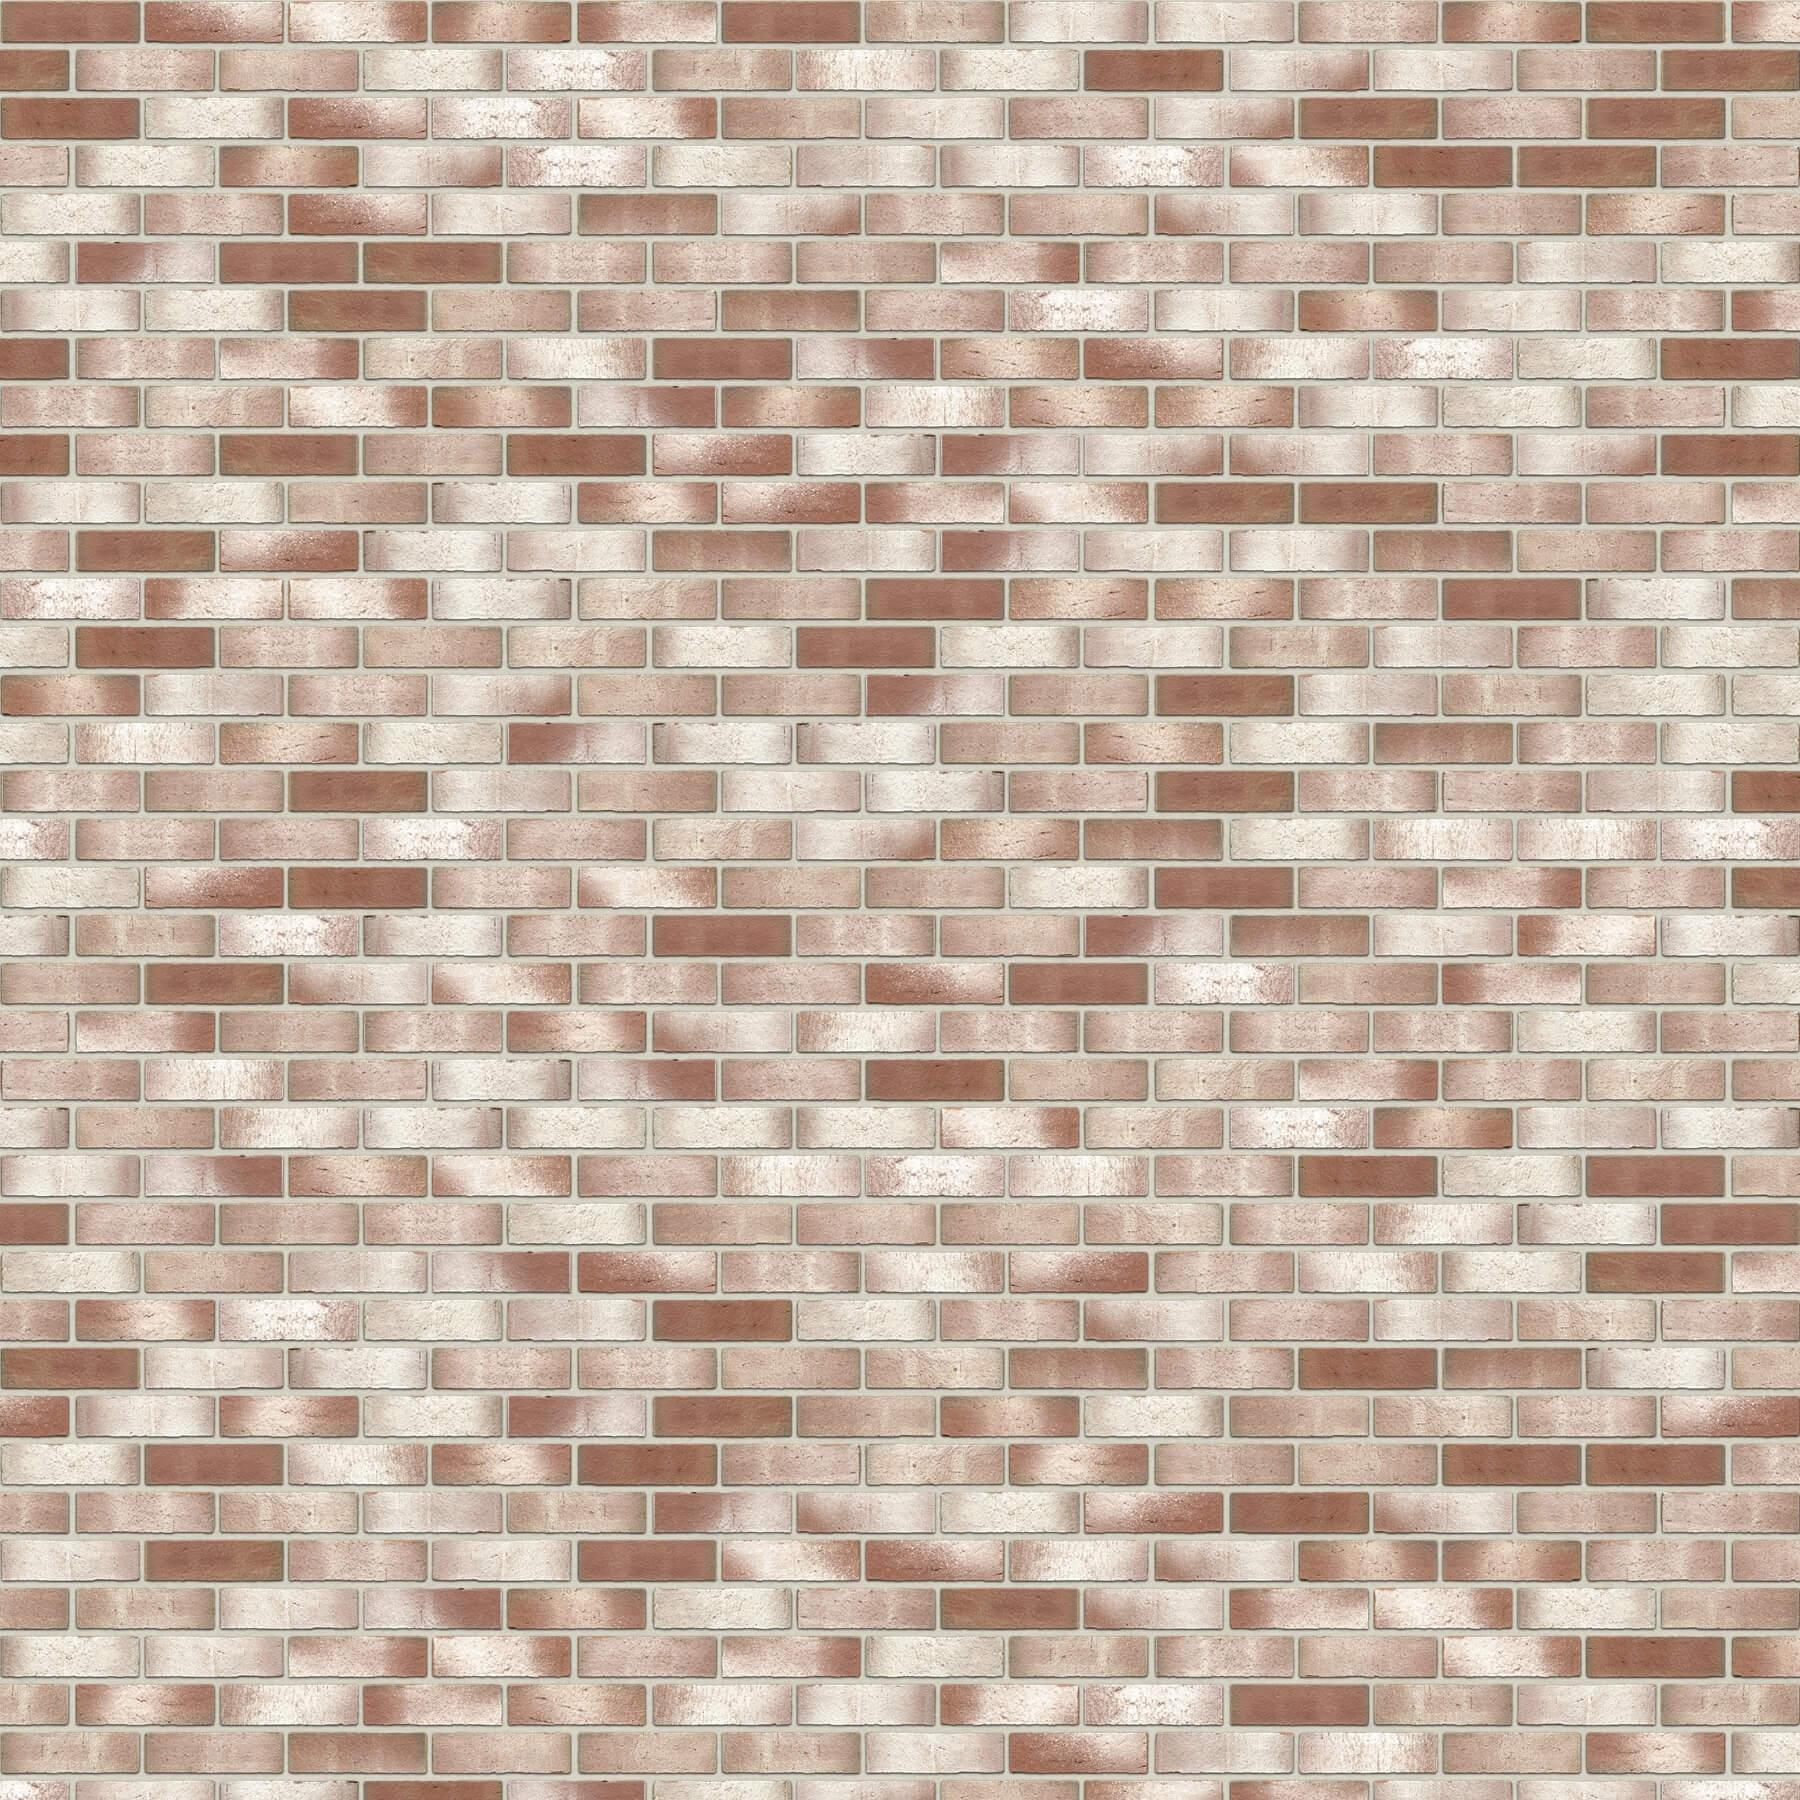 Puna-cigla-FeldHaus-Klinker-brick-house-beograd-nf-k-923-Bela Fuga